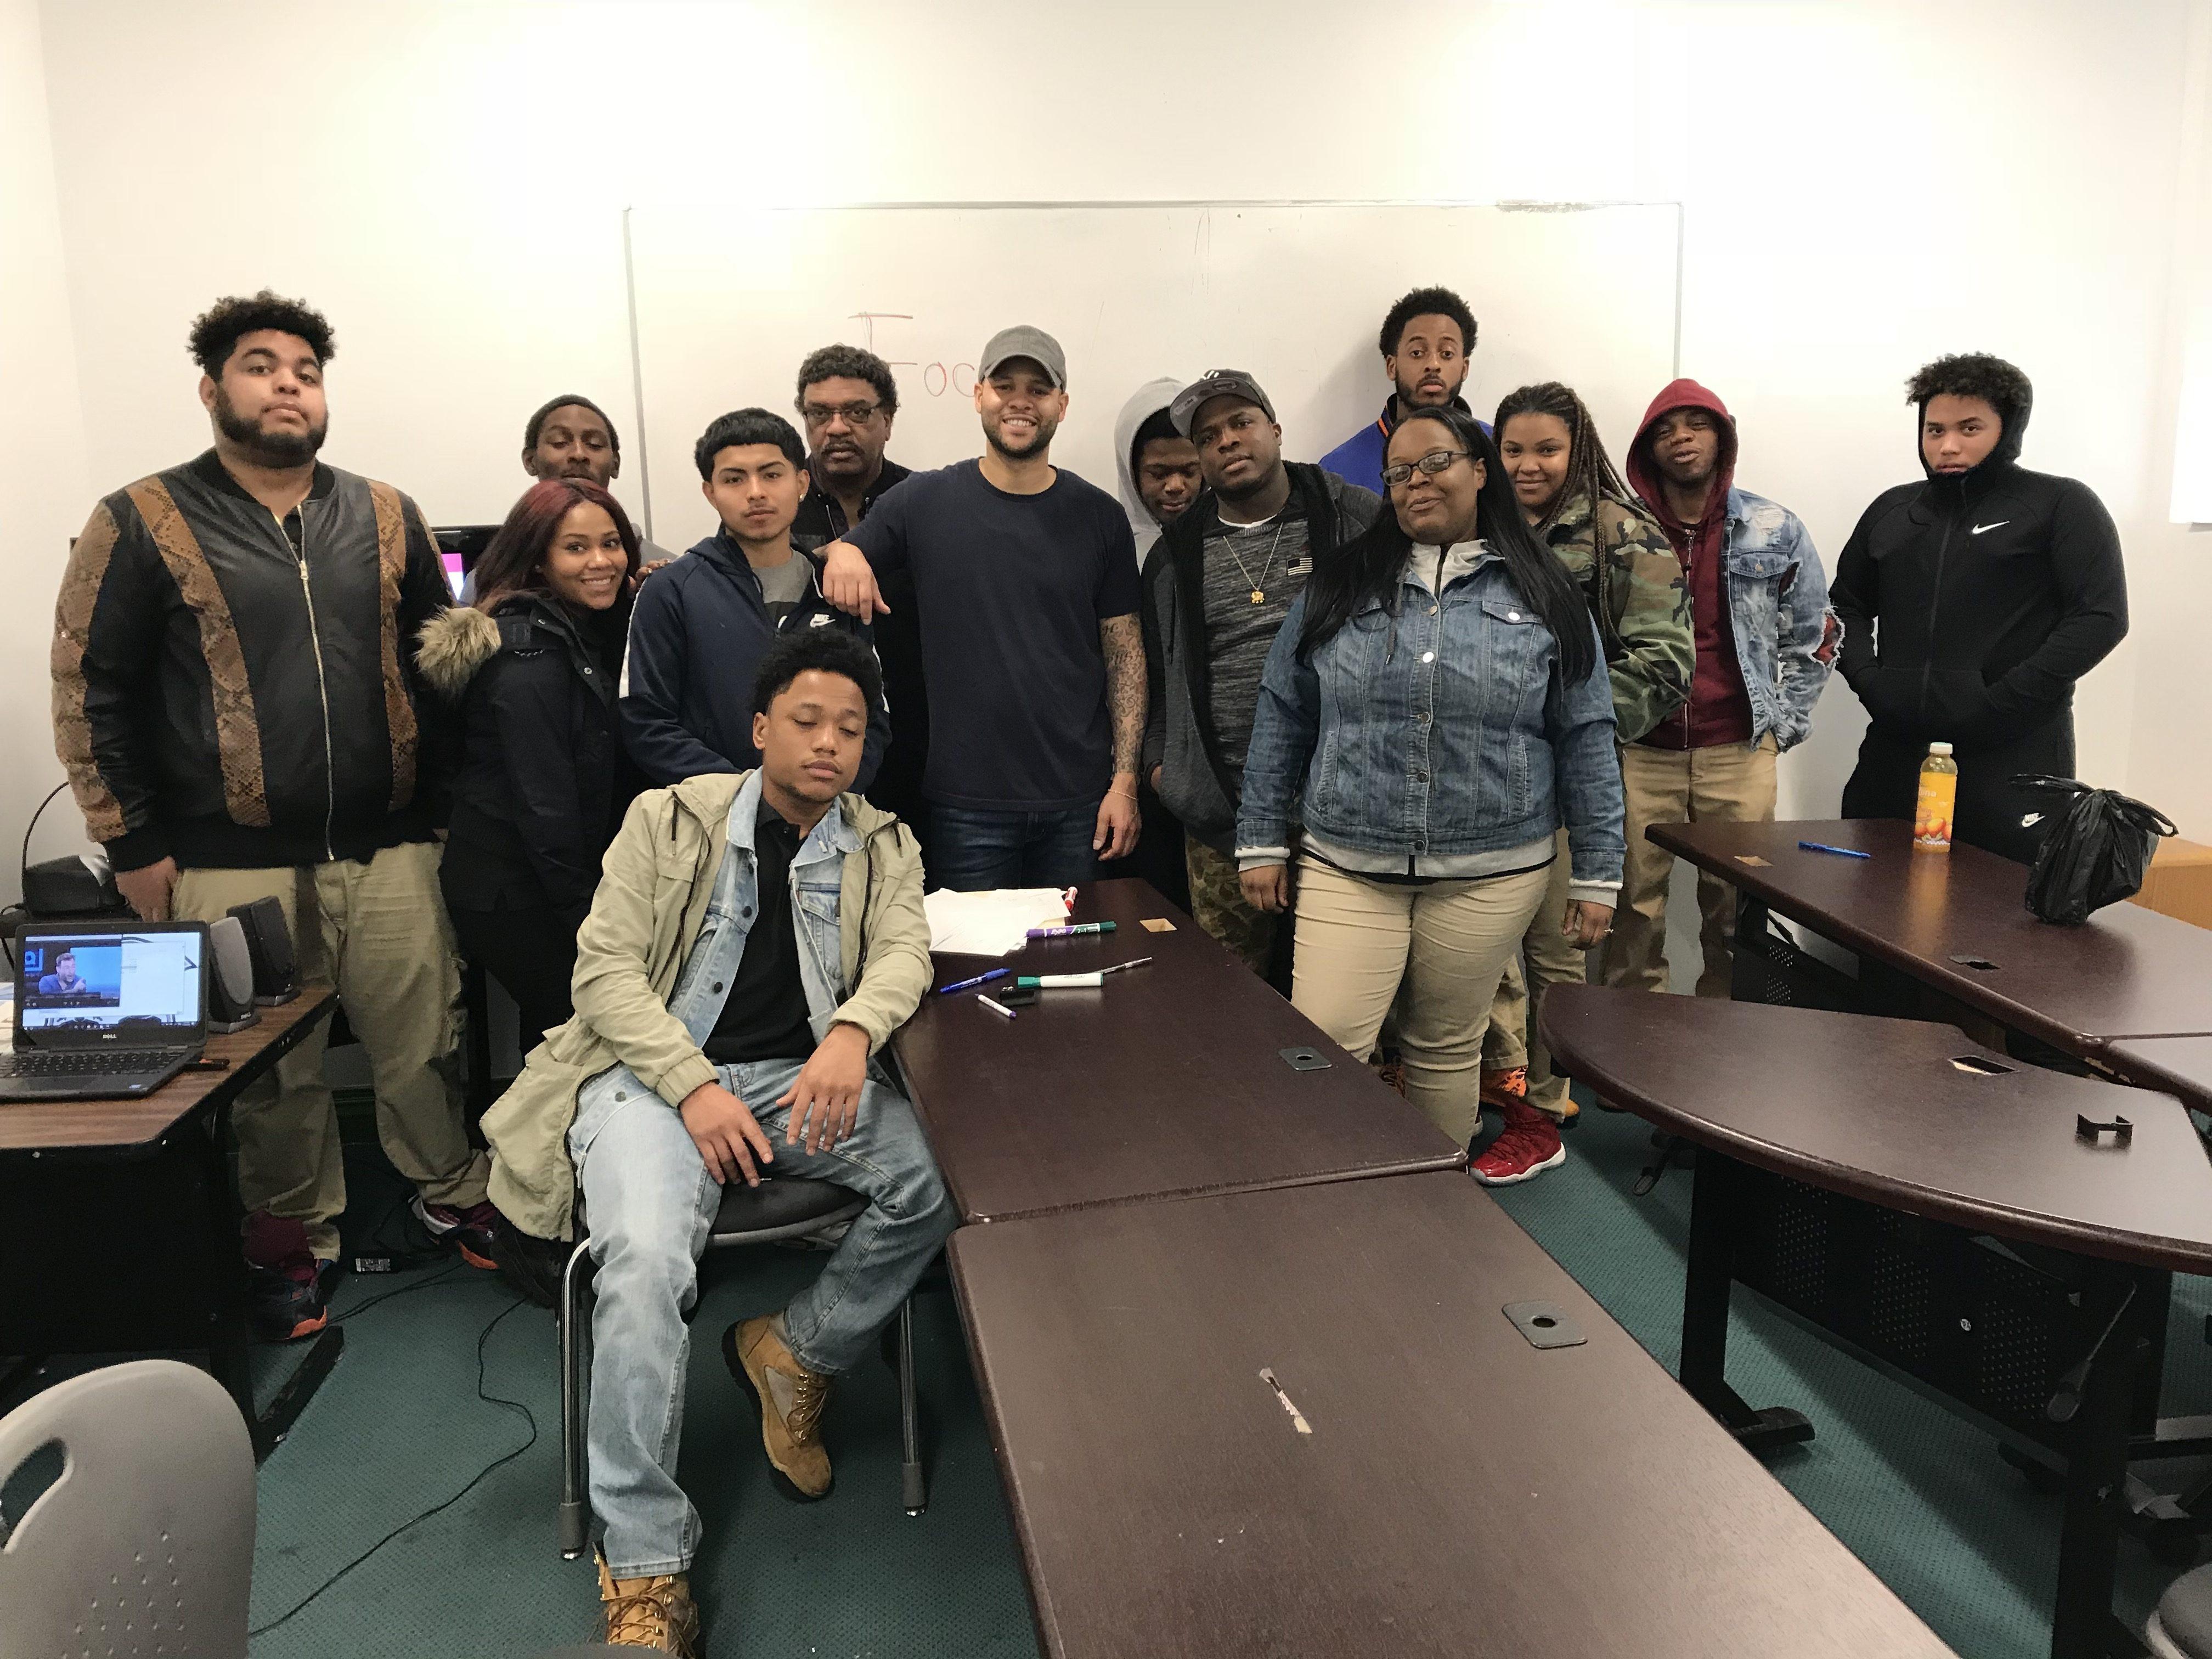 LICCV Workshop At United Way (Youth Build) Long Island